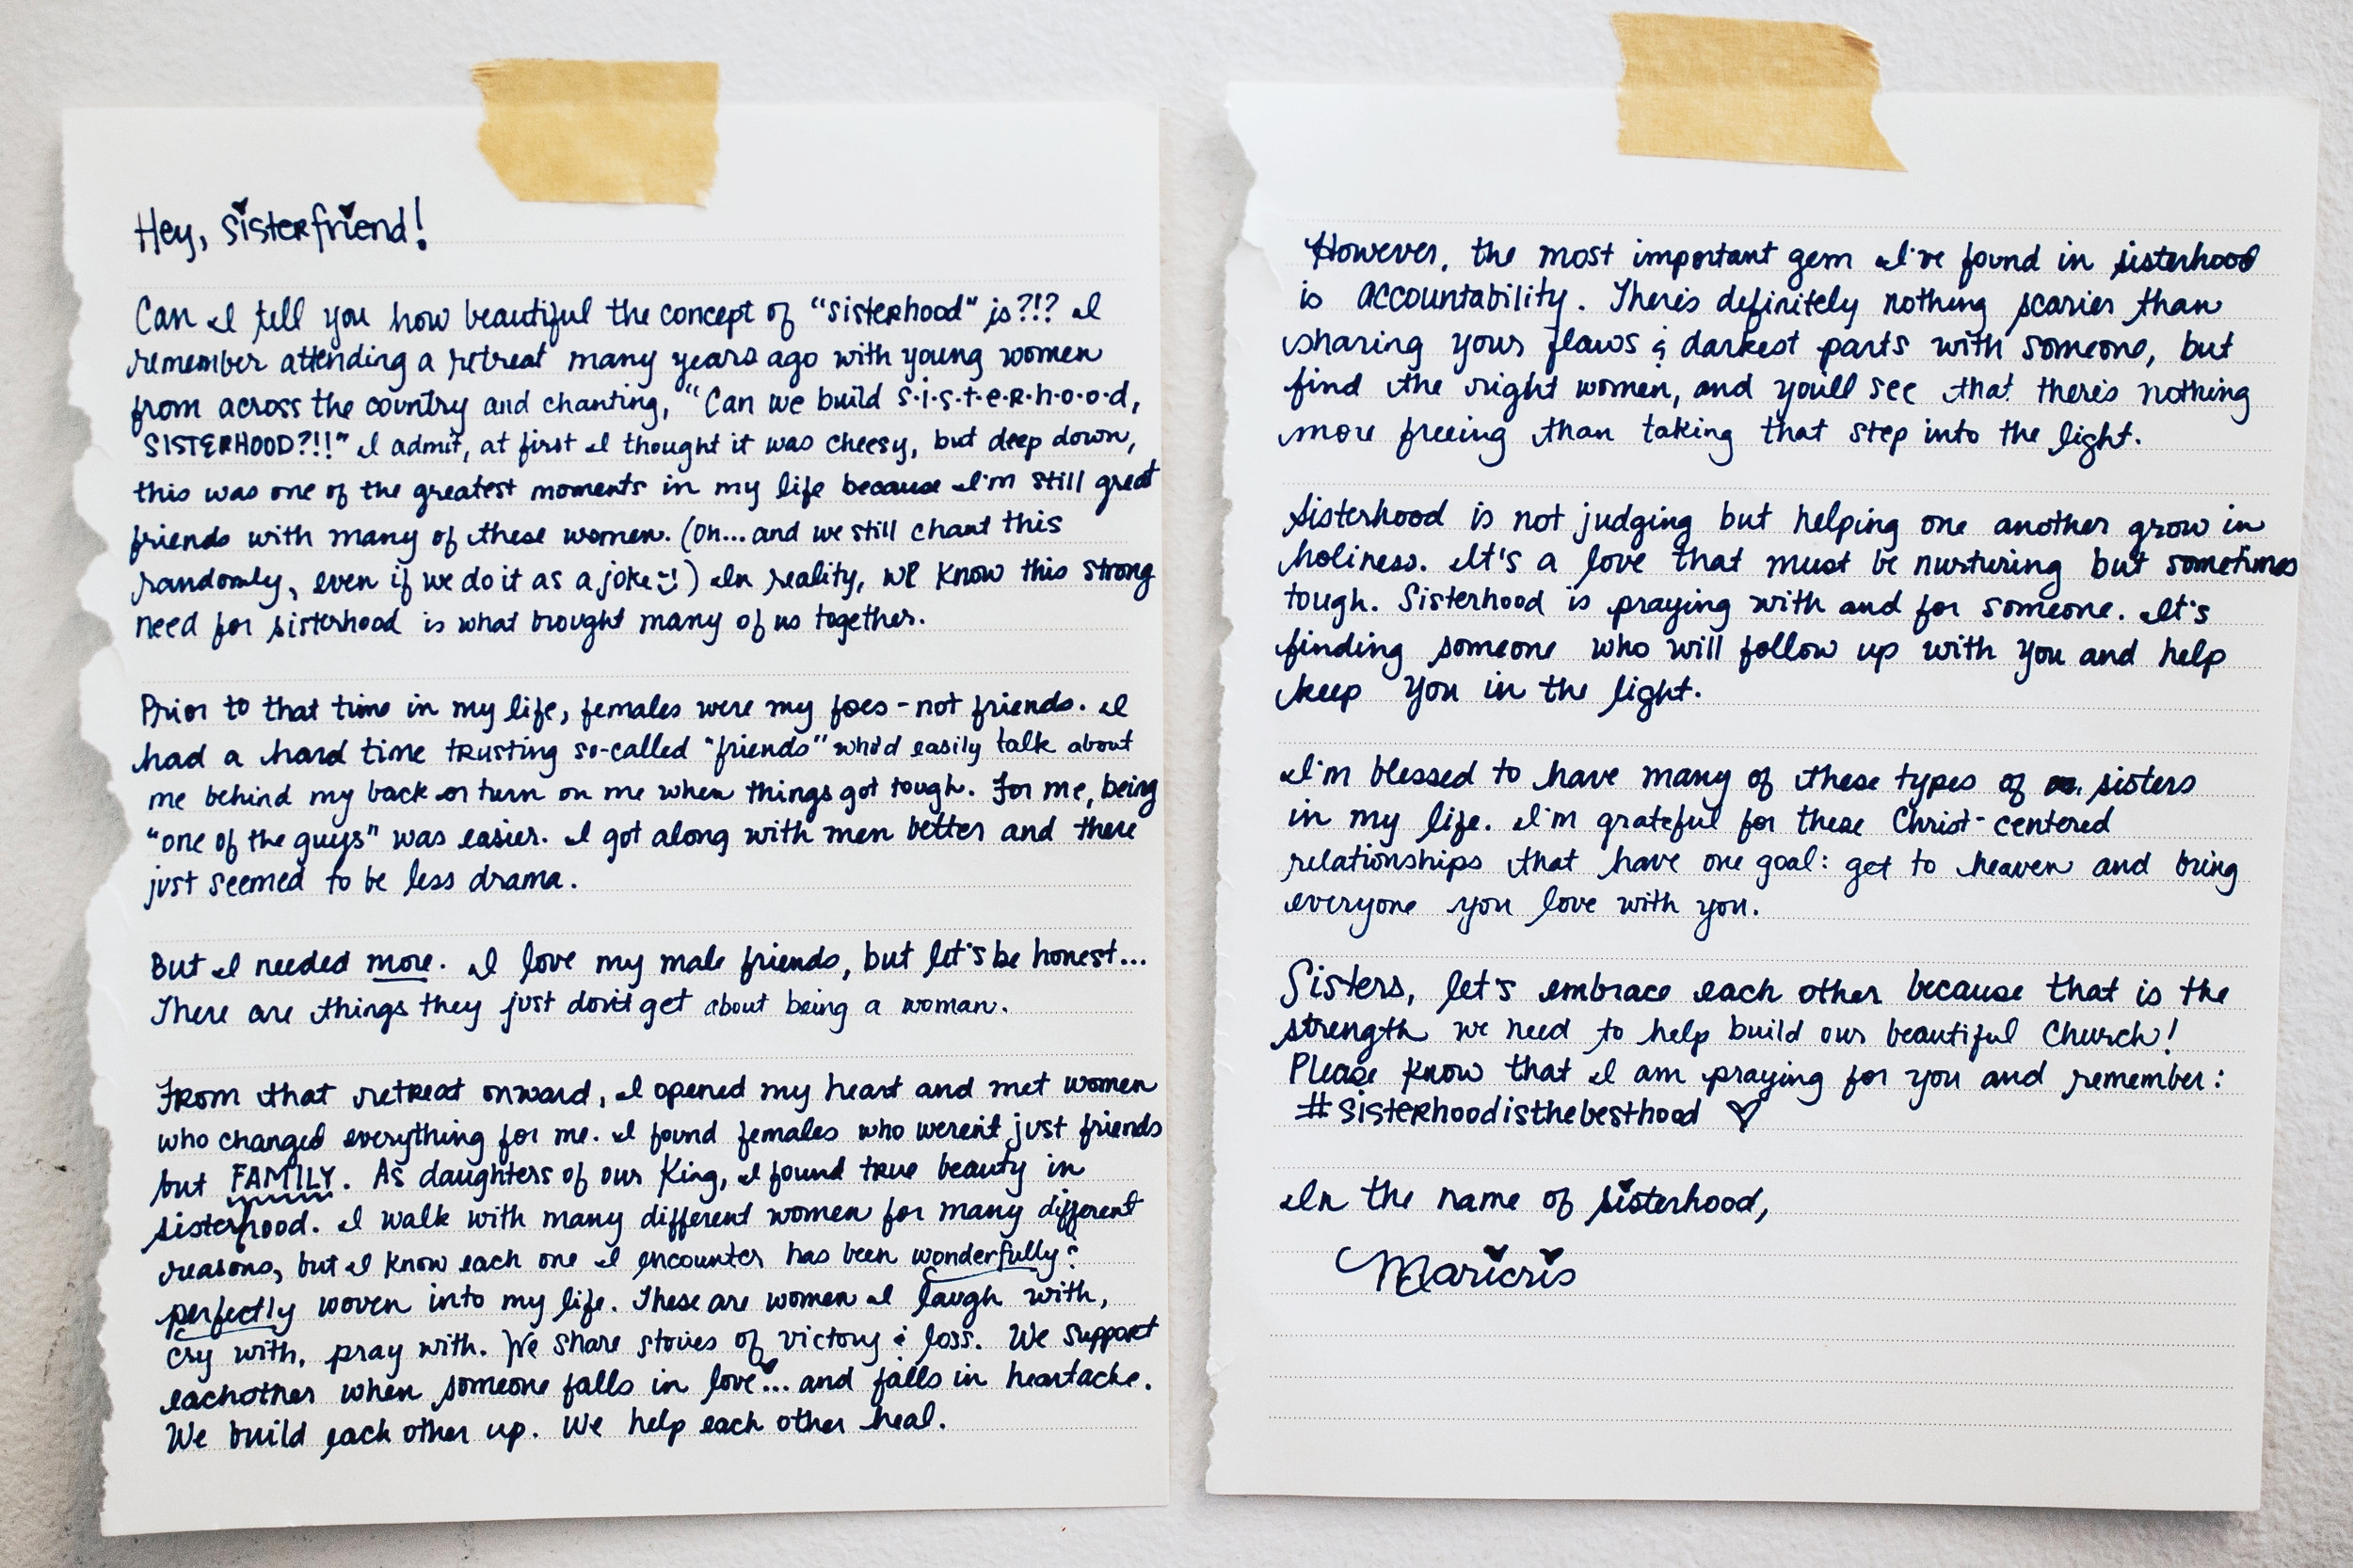 The-Catholic-Woman-Maricris-Dizon-Letter-1